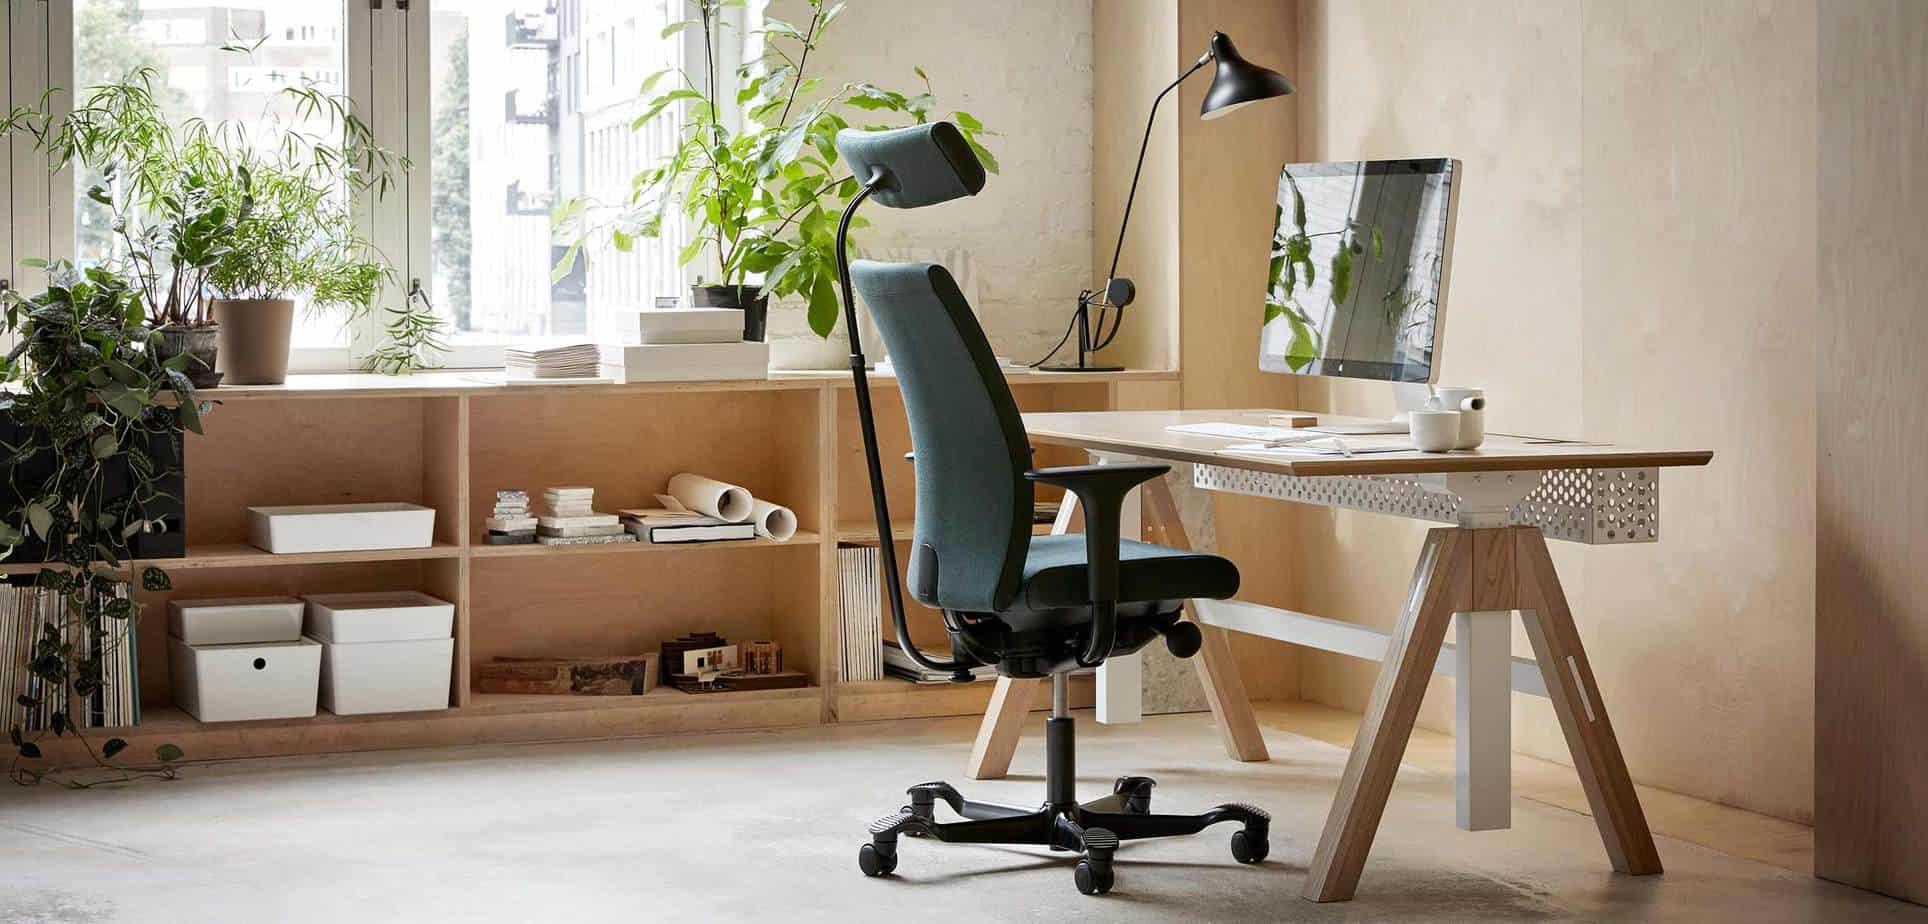 best home office decor 2021 plants